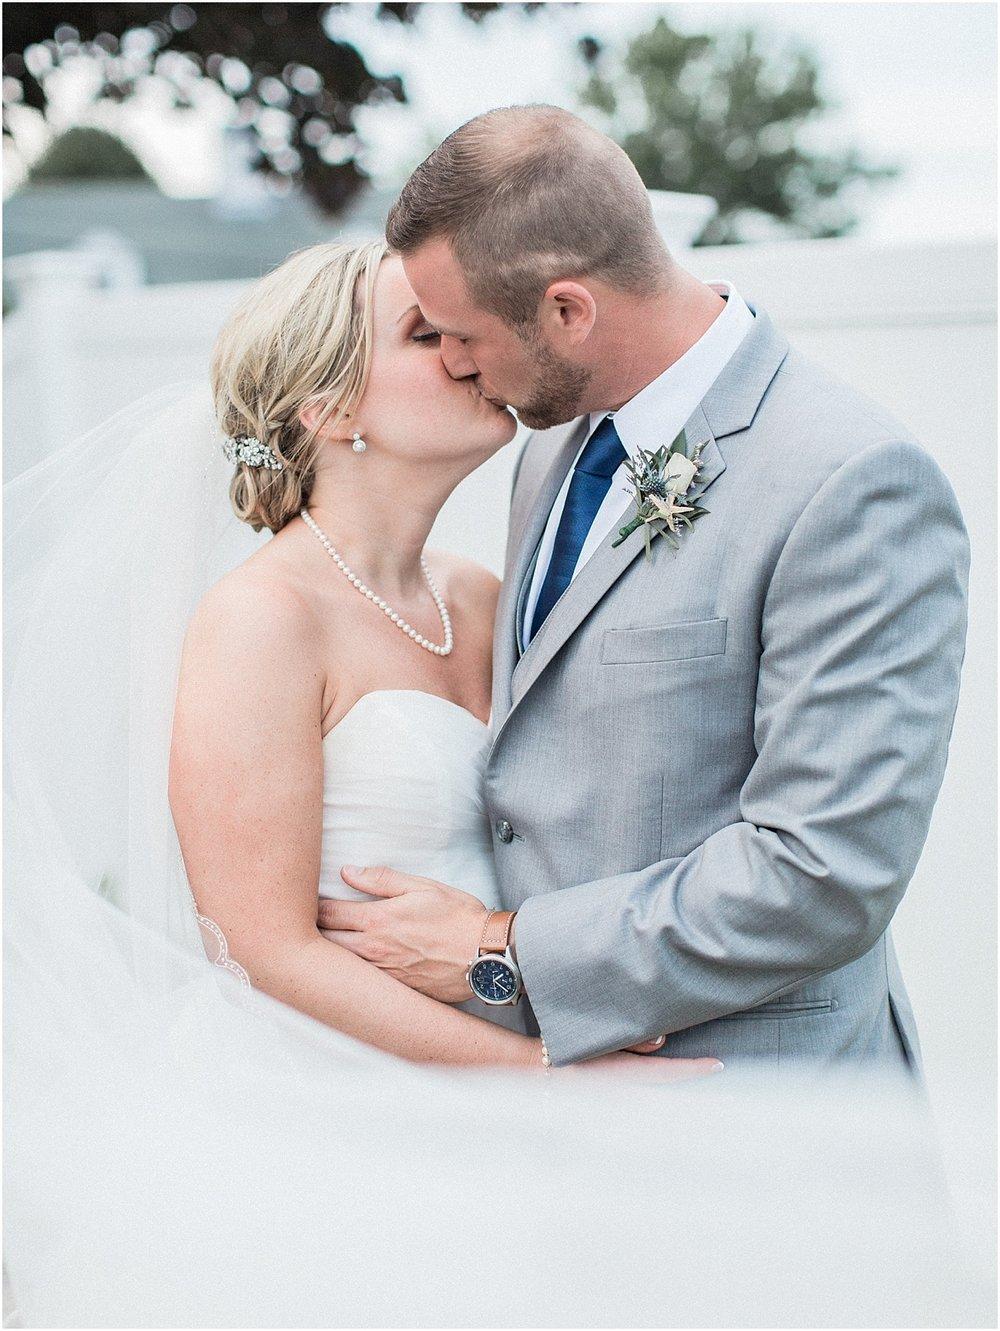 samantha_anthony_sam_old_scituate_light_barker_tavern_south_shore_cape_cod_boston_wedding_photographer_meredith_jane_photography_photo_0305.jpg